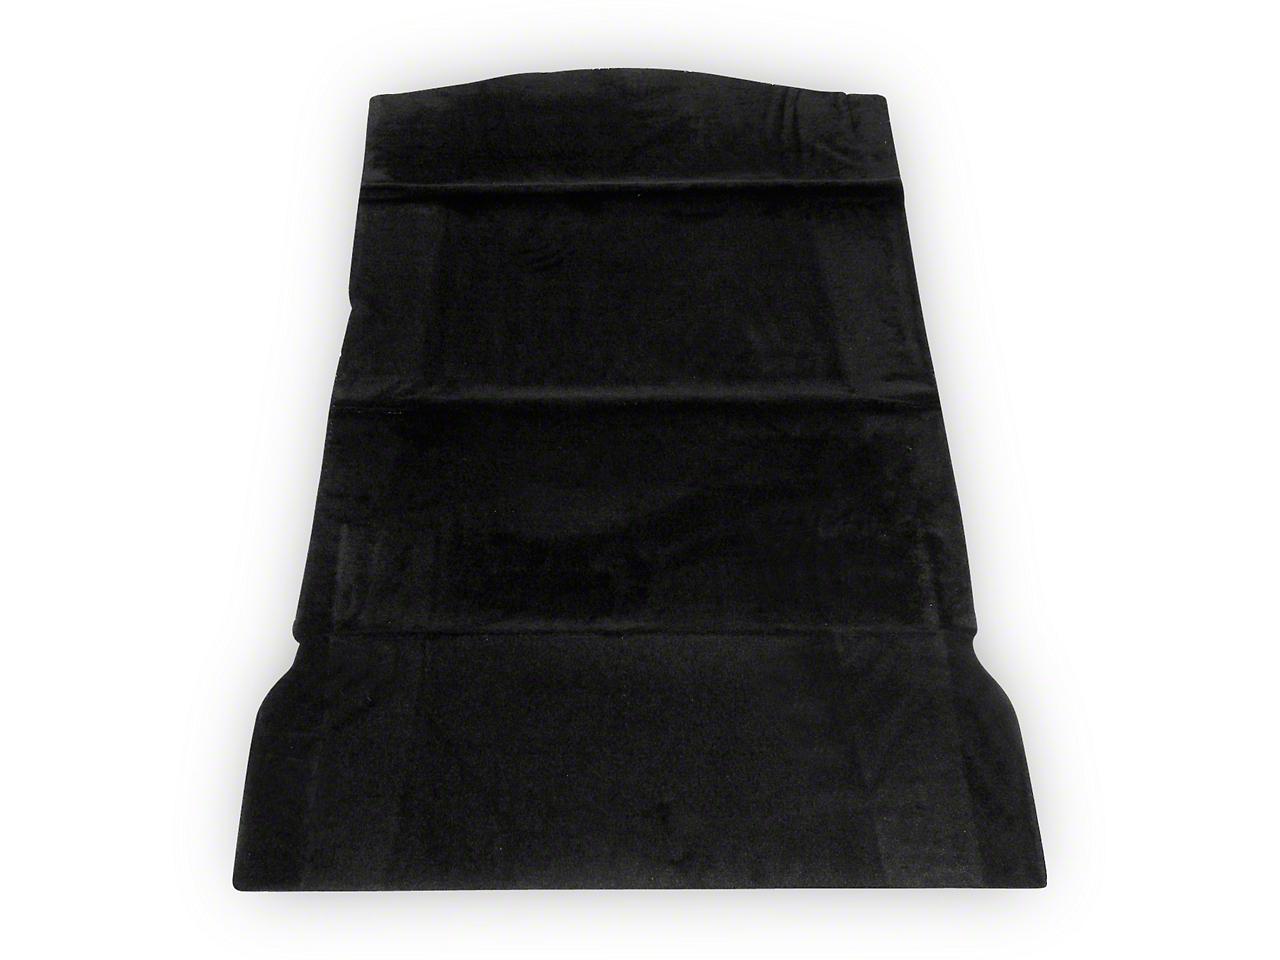 SpeedForm Rear Seat Delete Kit - Black (79-93 Hatchback)